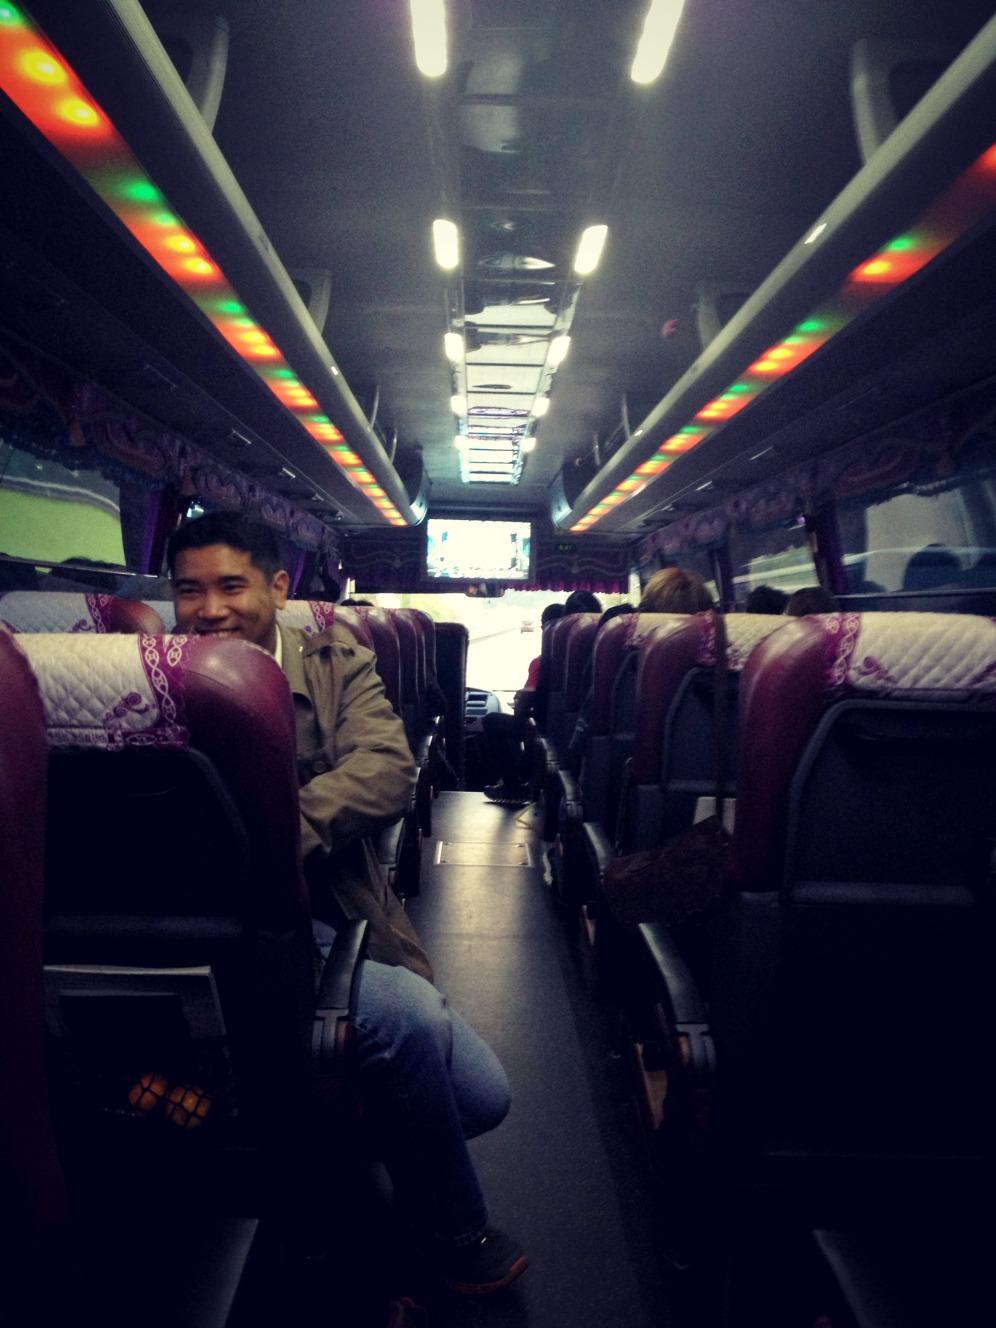 Norebang Party Bus